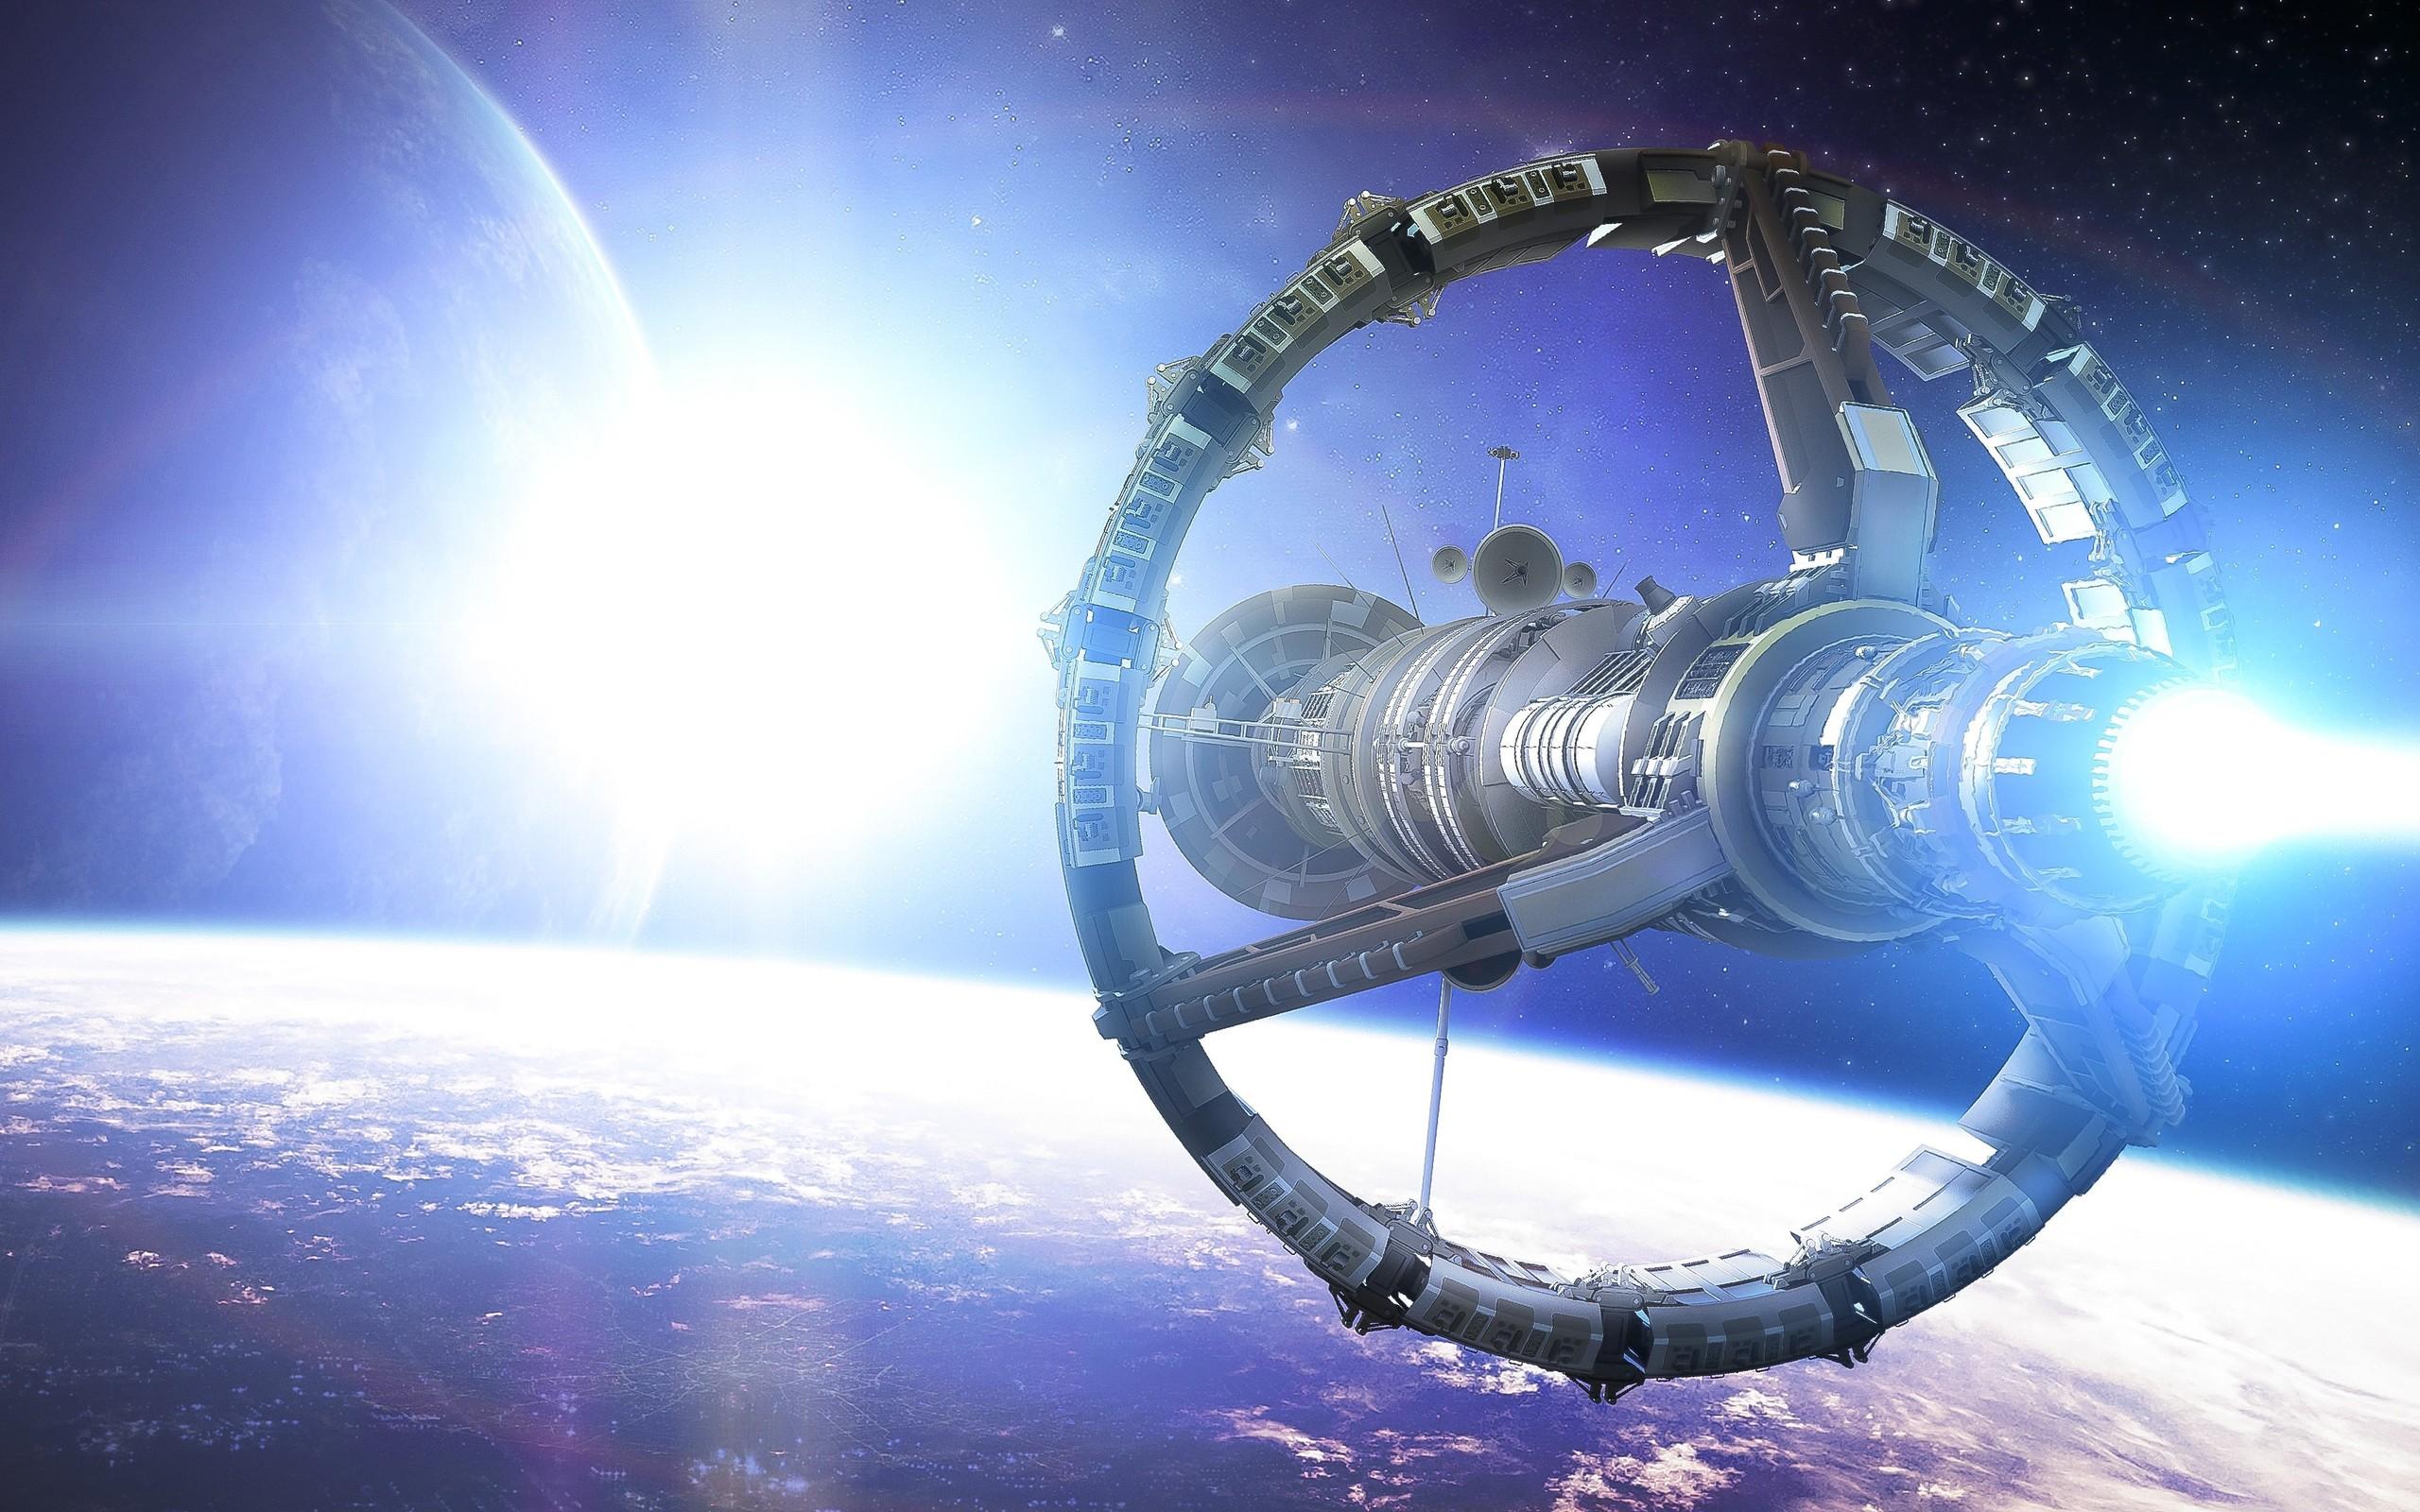 Wallpapers Space Spaceship Wallpaper 2560x1600